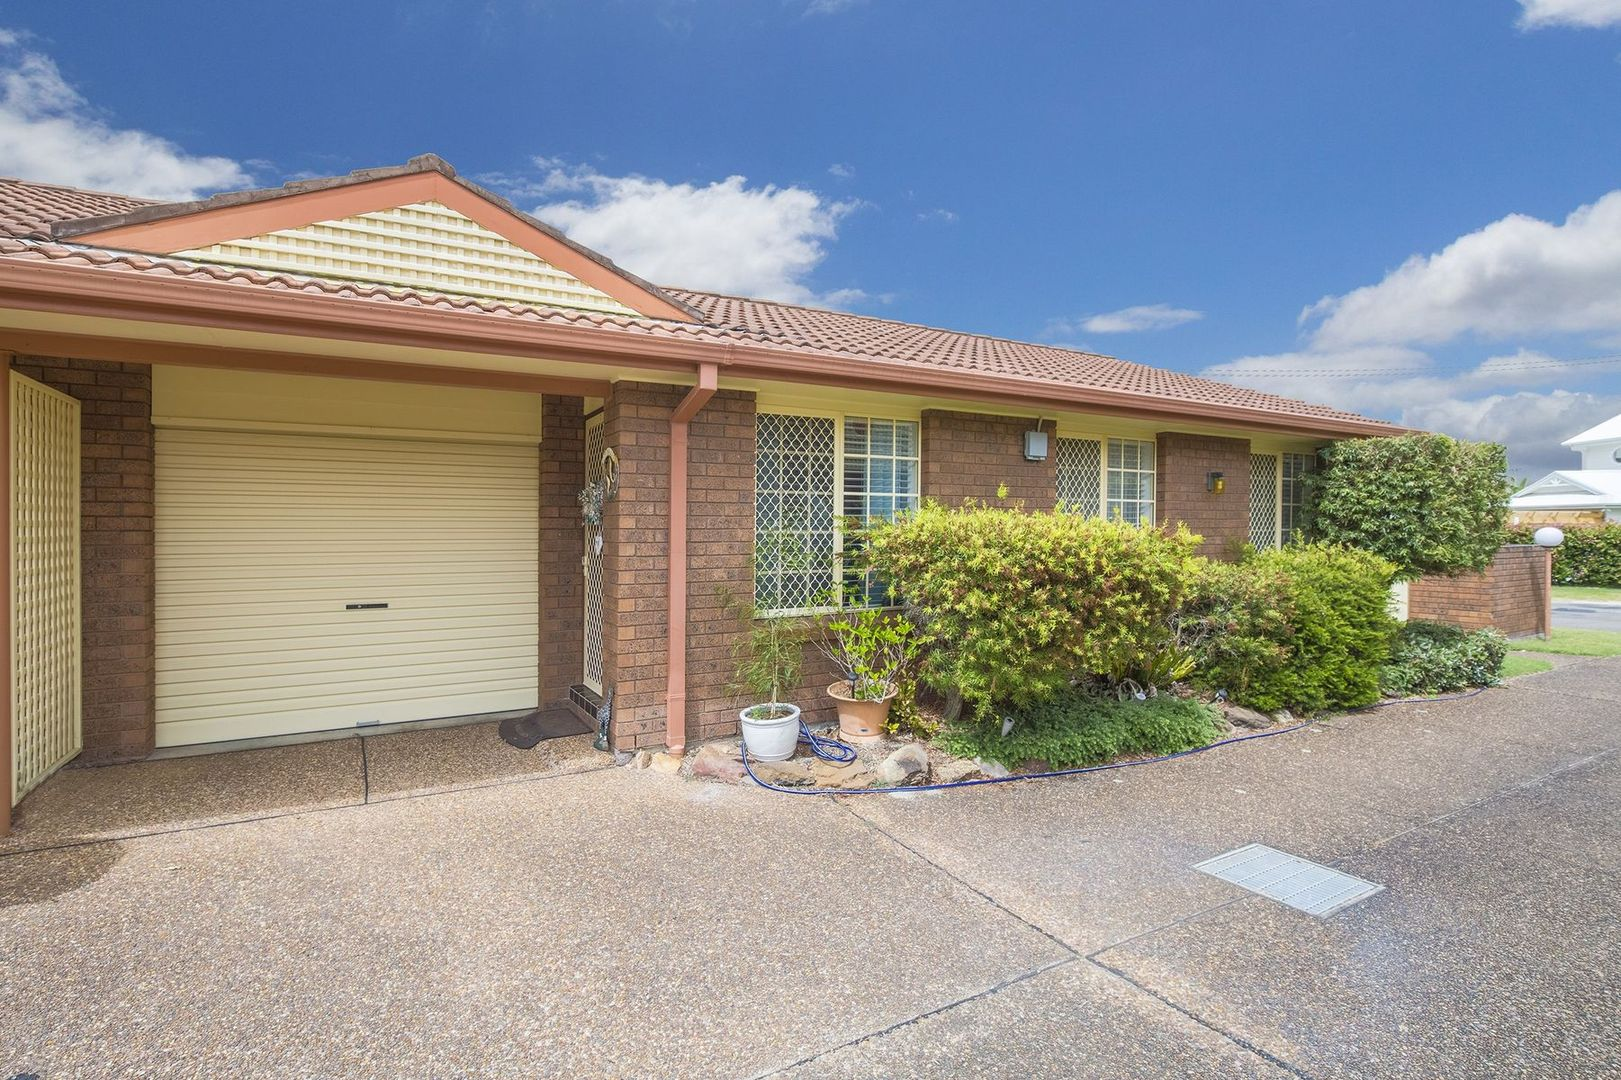 7/40-44 Nirvana Street, Long Jetty NSW 2261, Image 0